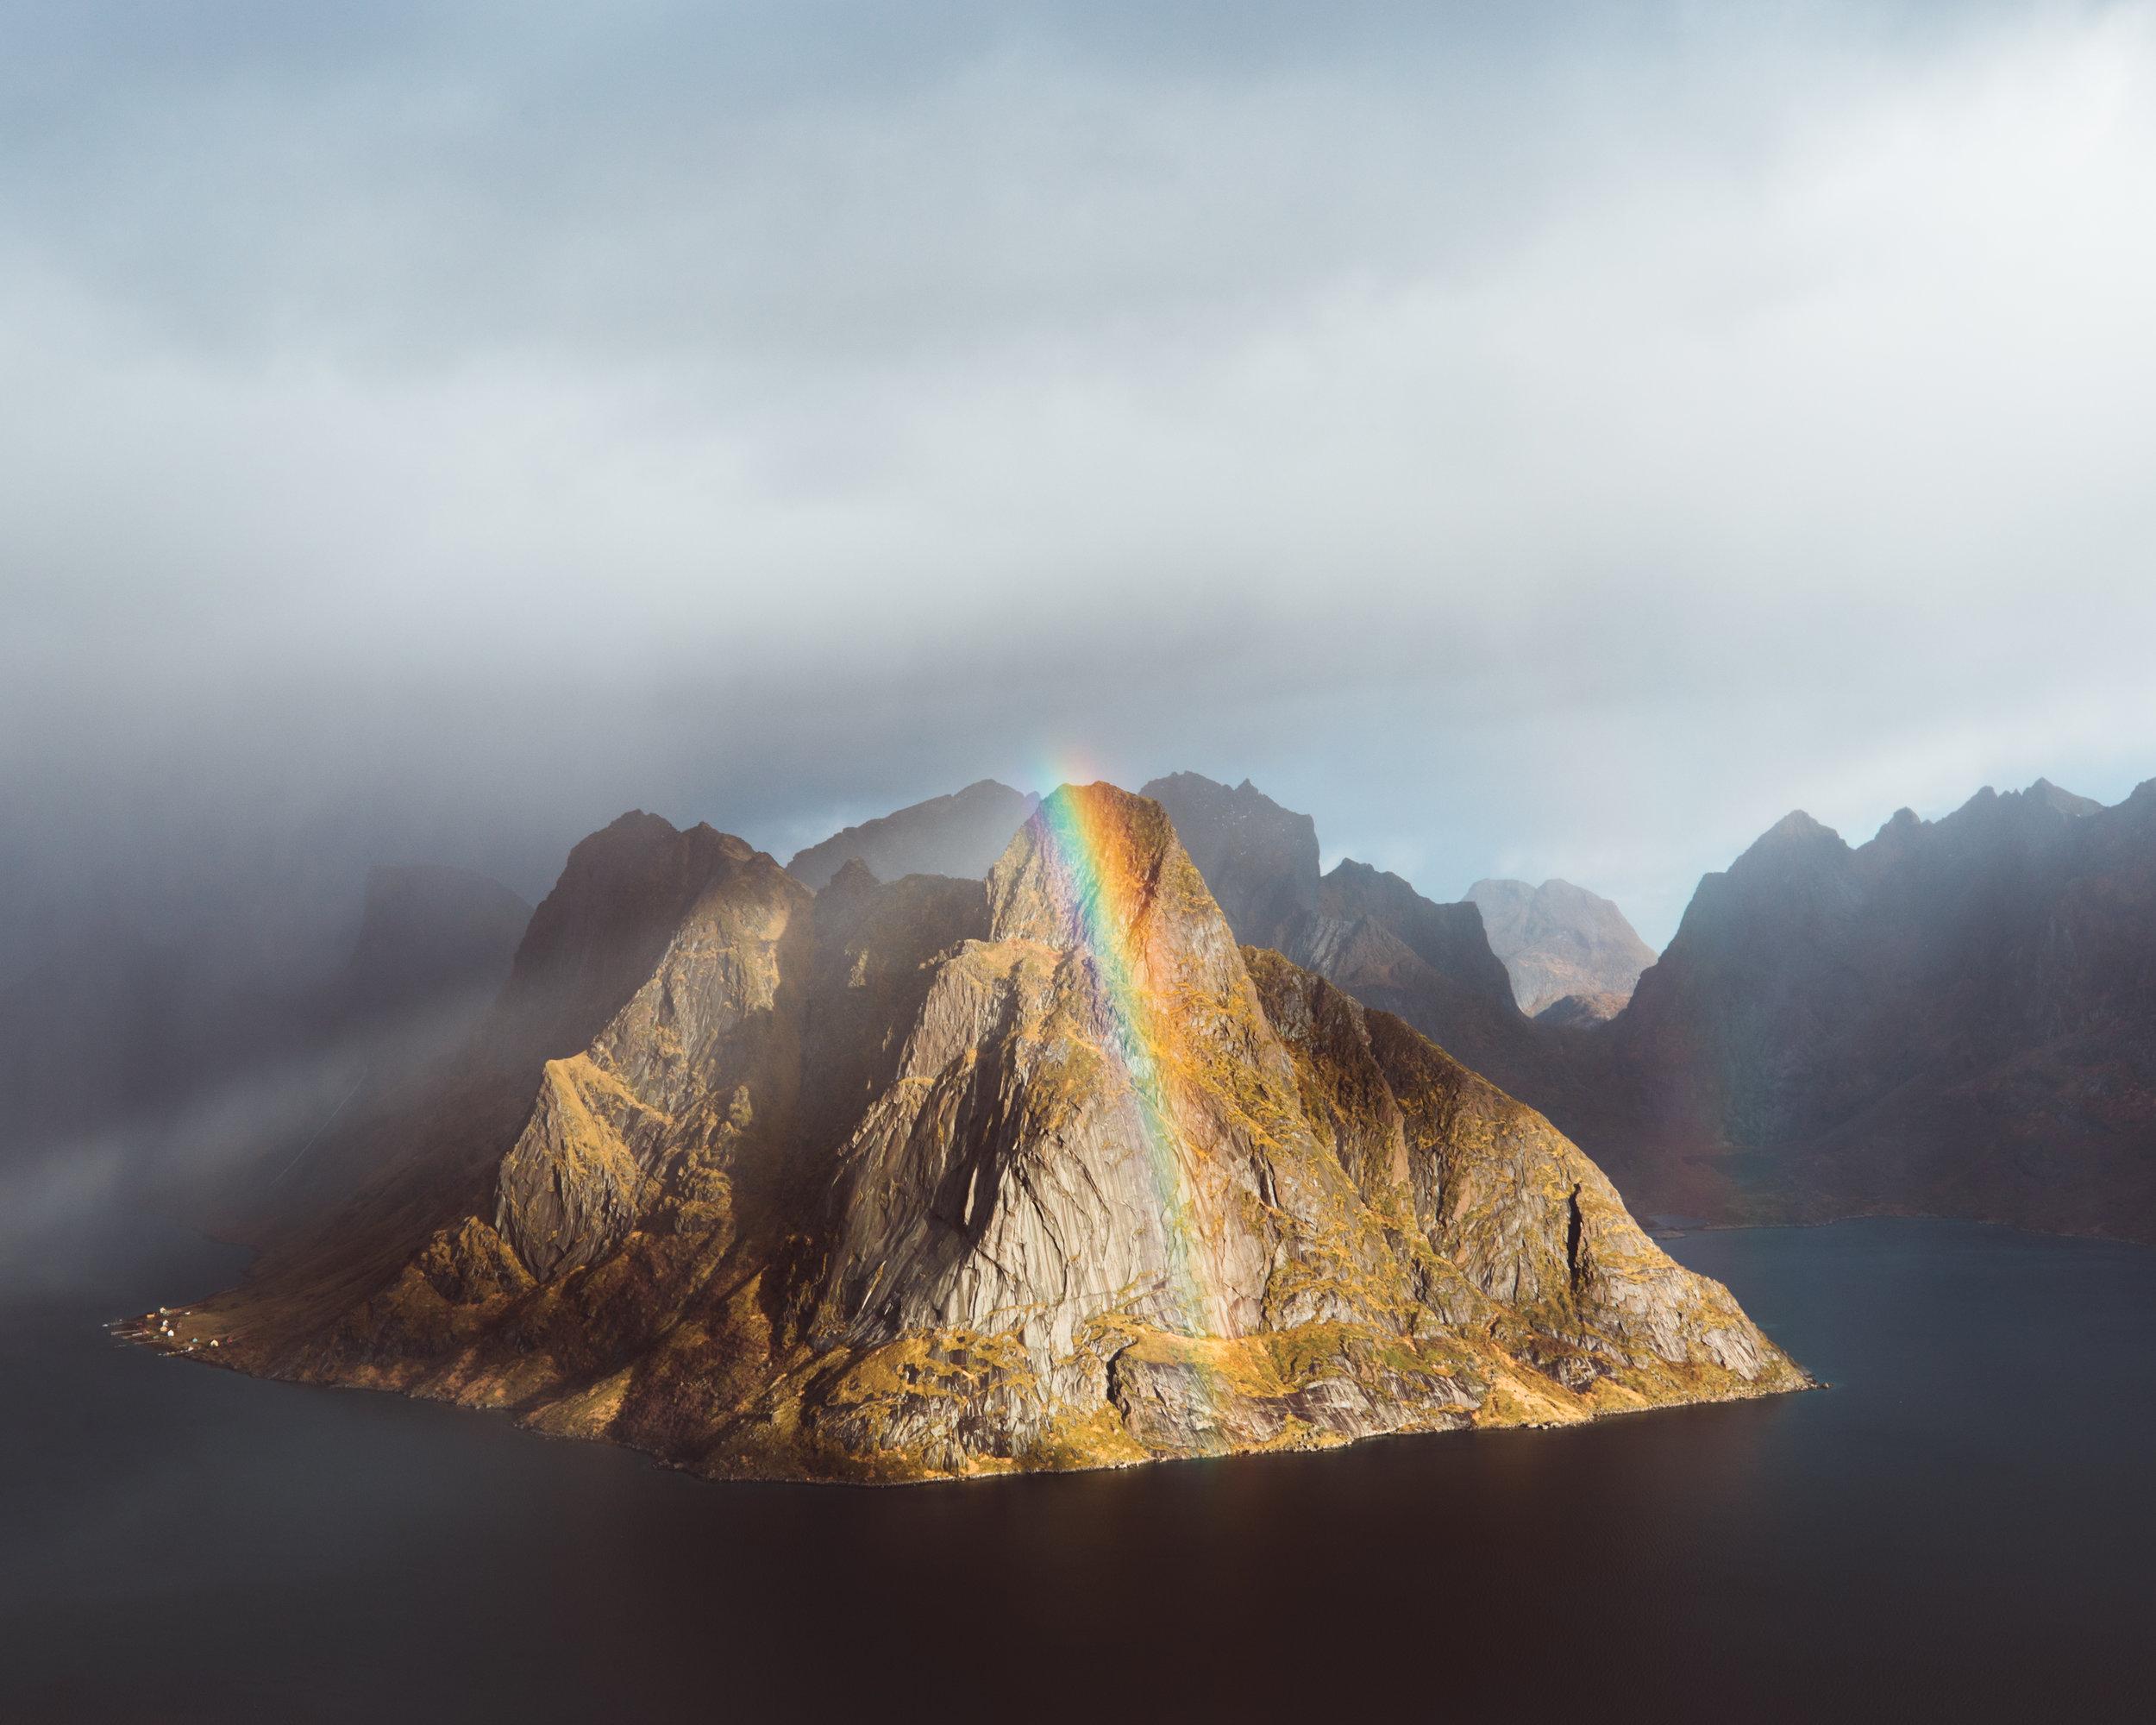 rainbow_lofoten_joel_hypponen_04.jpg